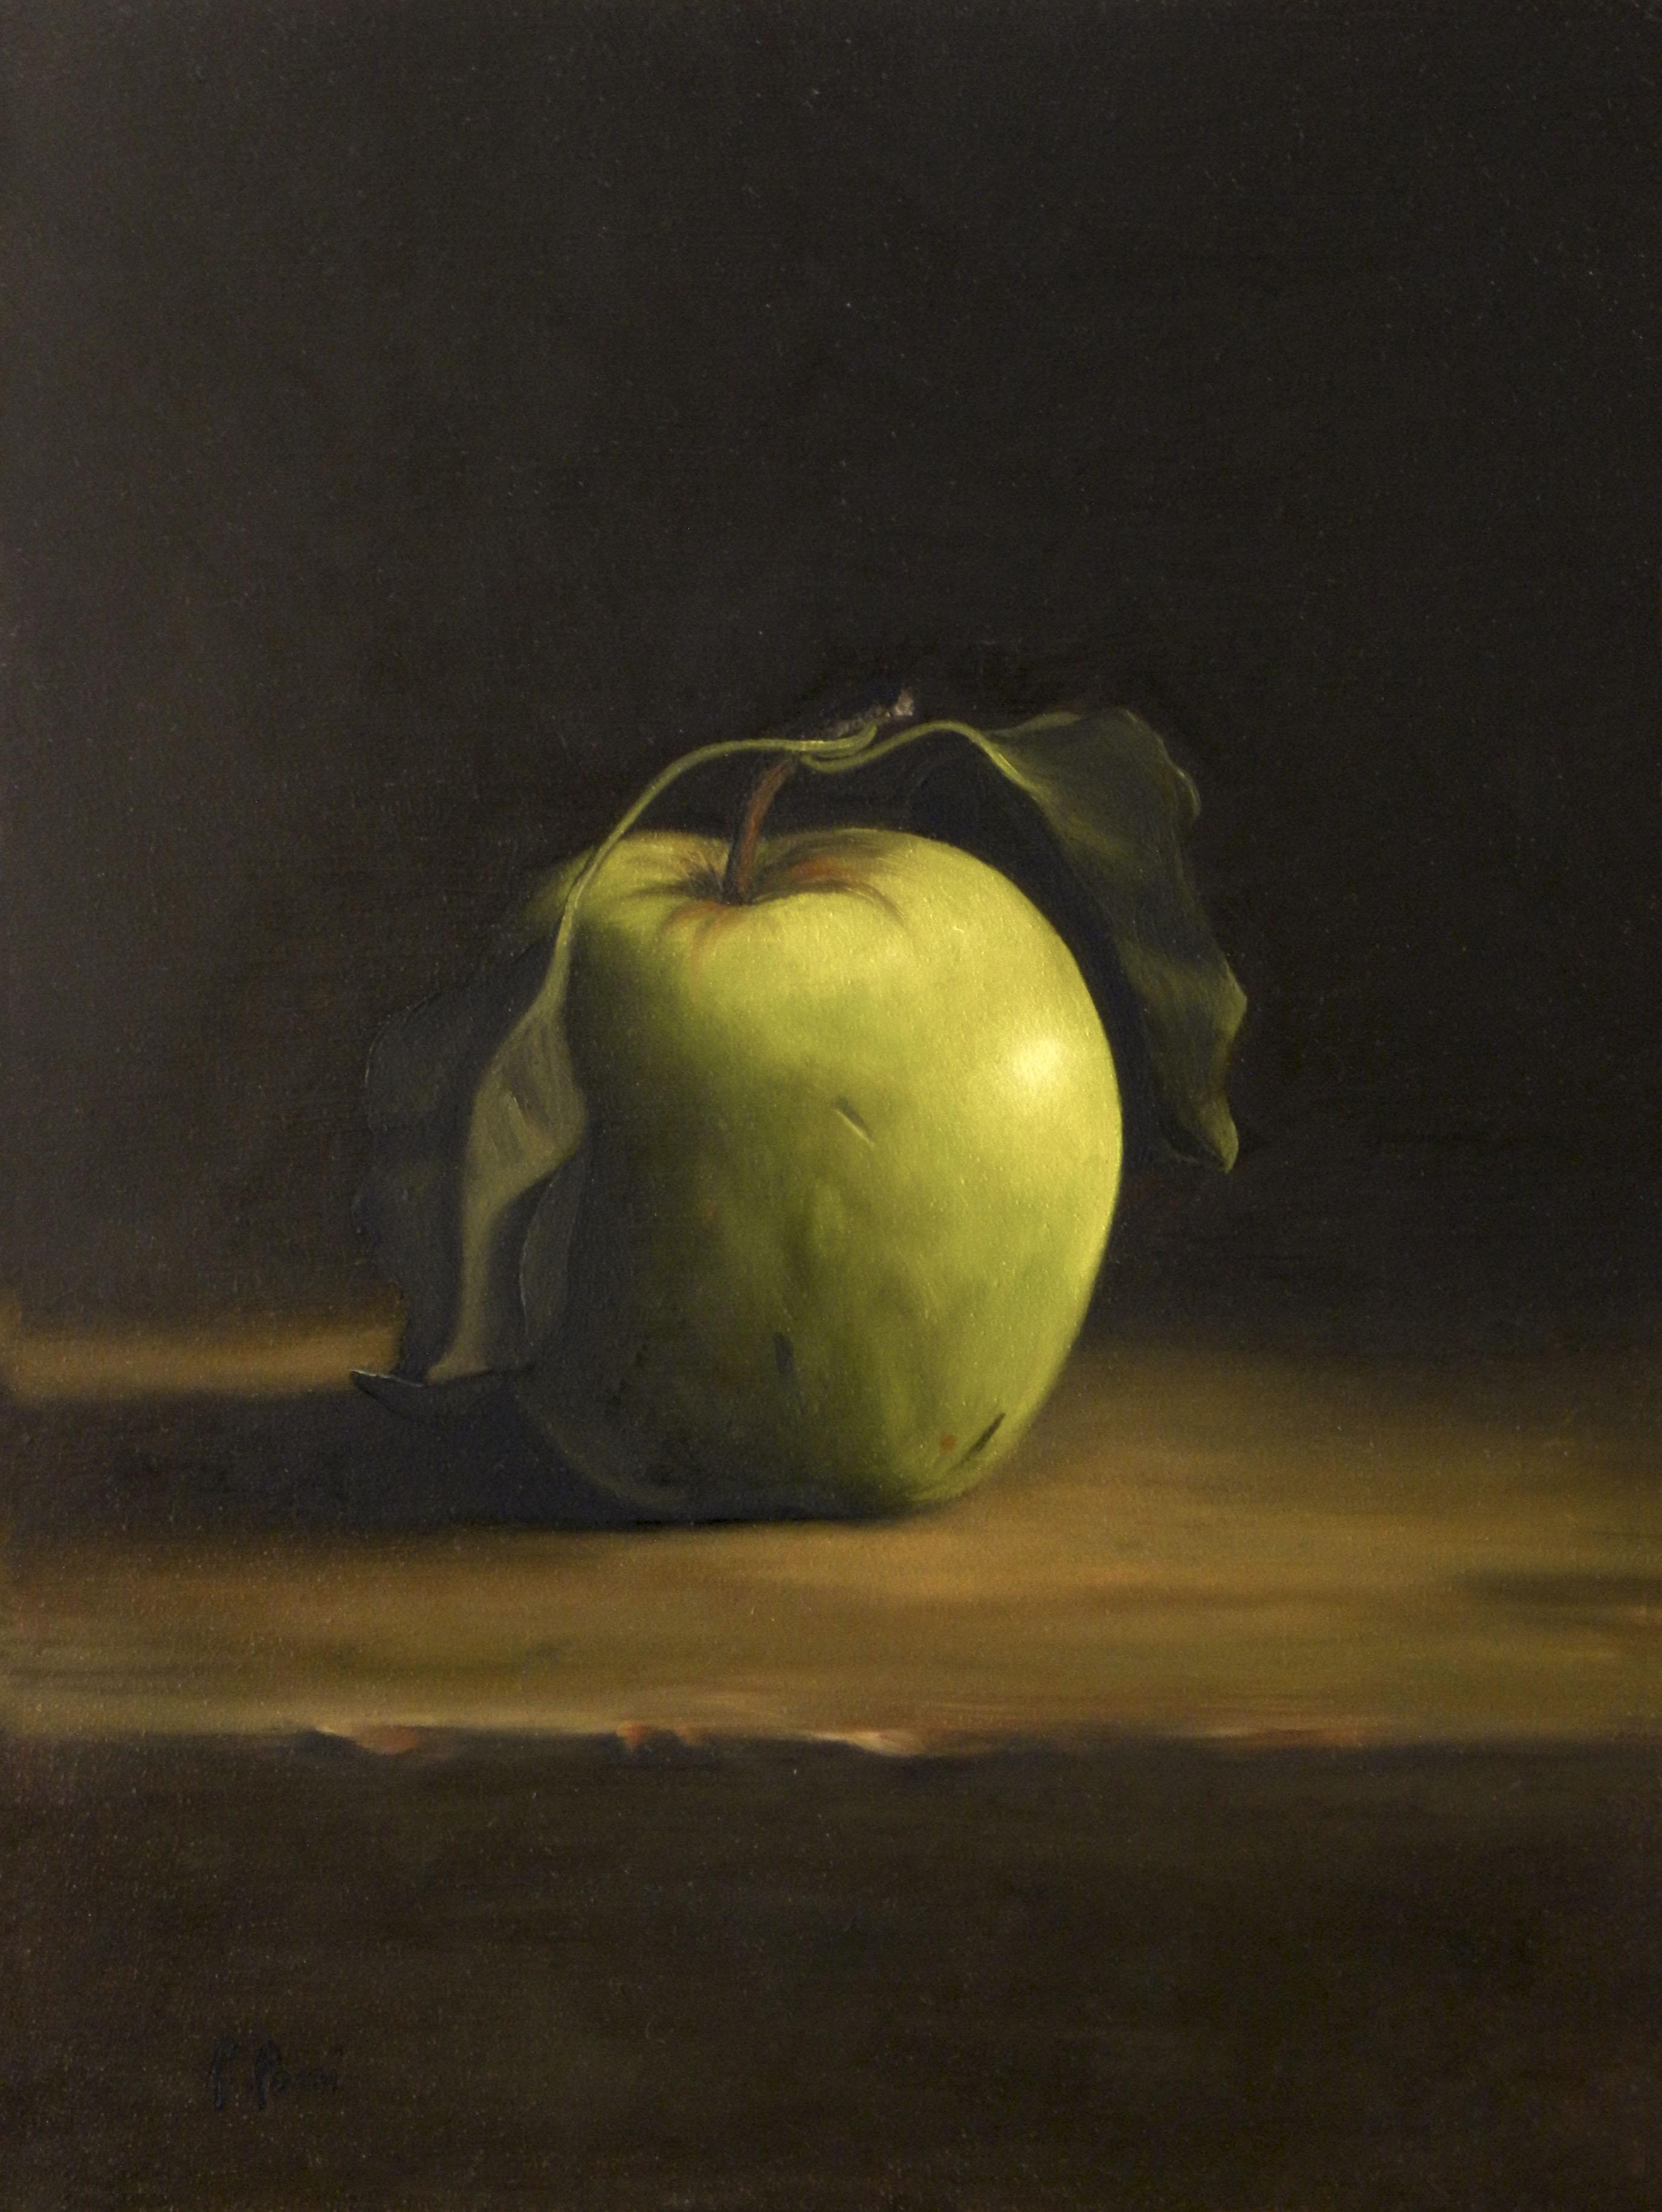 2015 roberta rossi – mela e foglie – olio su tavola – 24 x 18